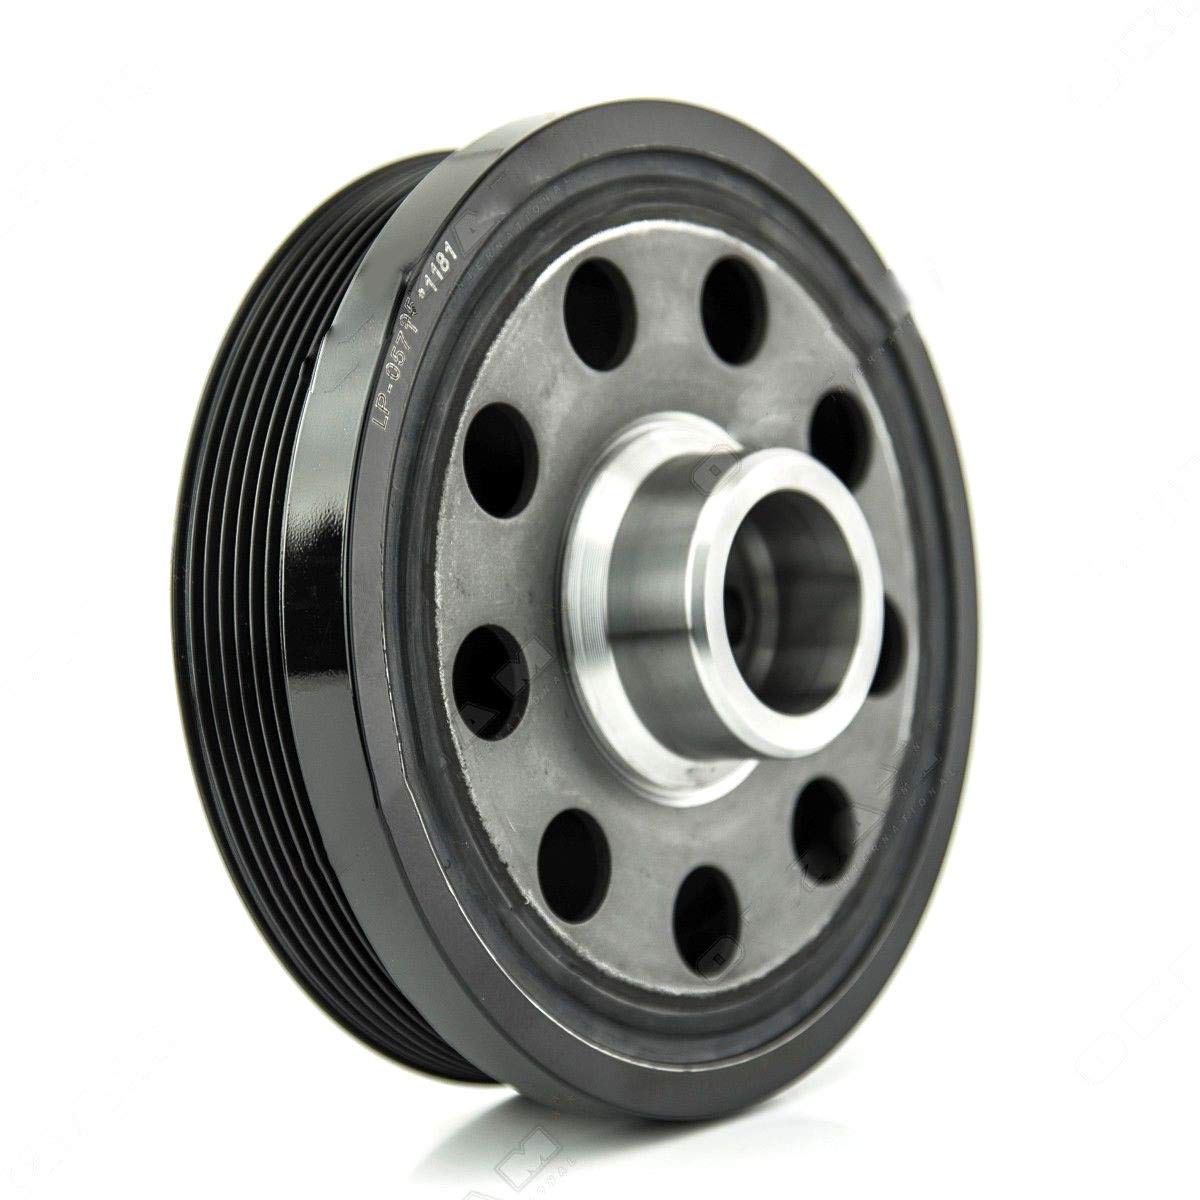 Crank Shaft Pulley FOR BMW F10 10-/>14 520d 2.0 Saloon Diesel N47D20C 184bhp